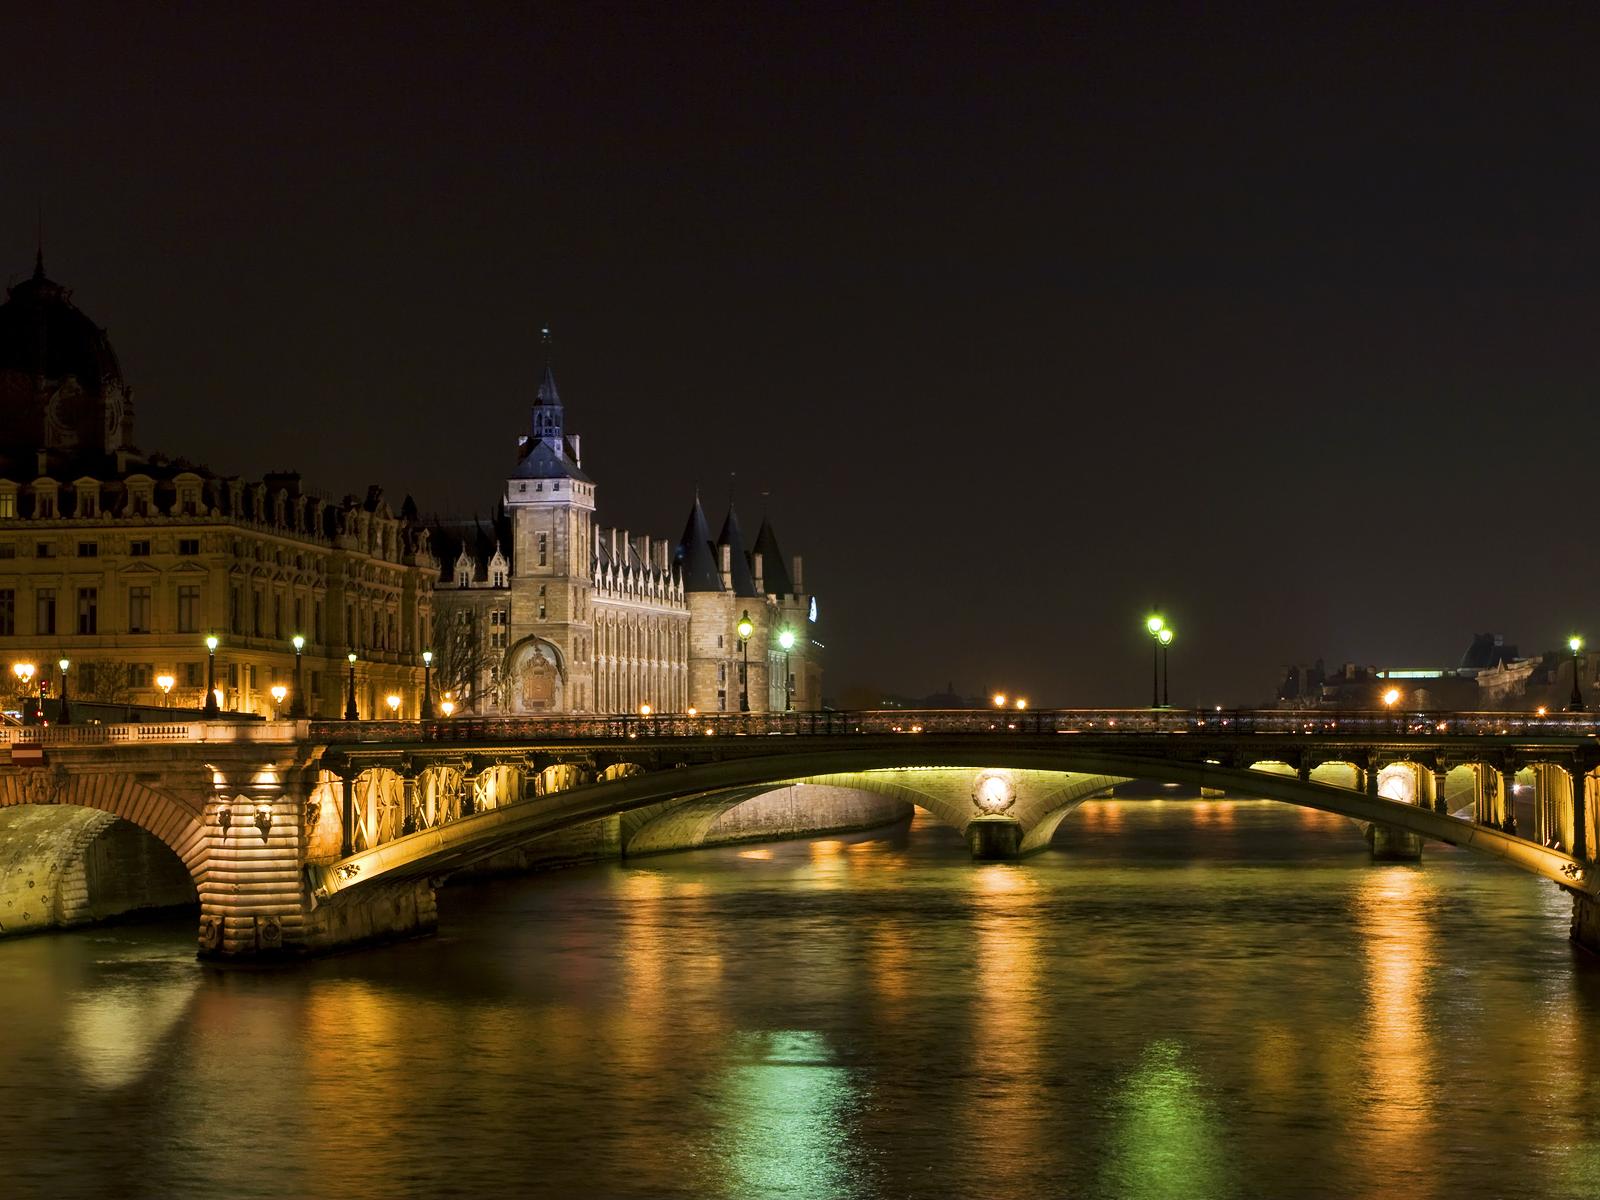 paris bridge at night wallpaper inkbluesky 1600x1200